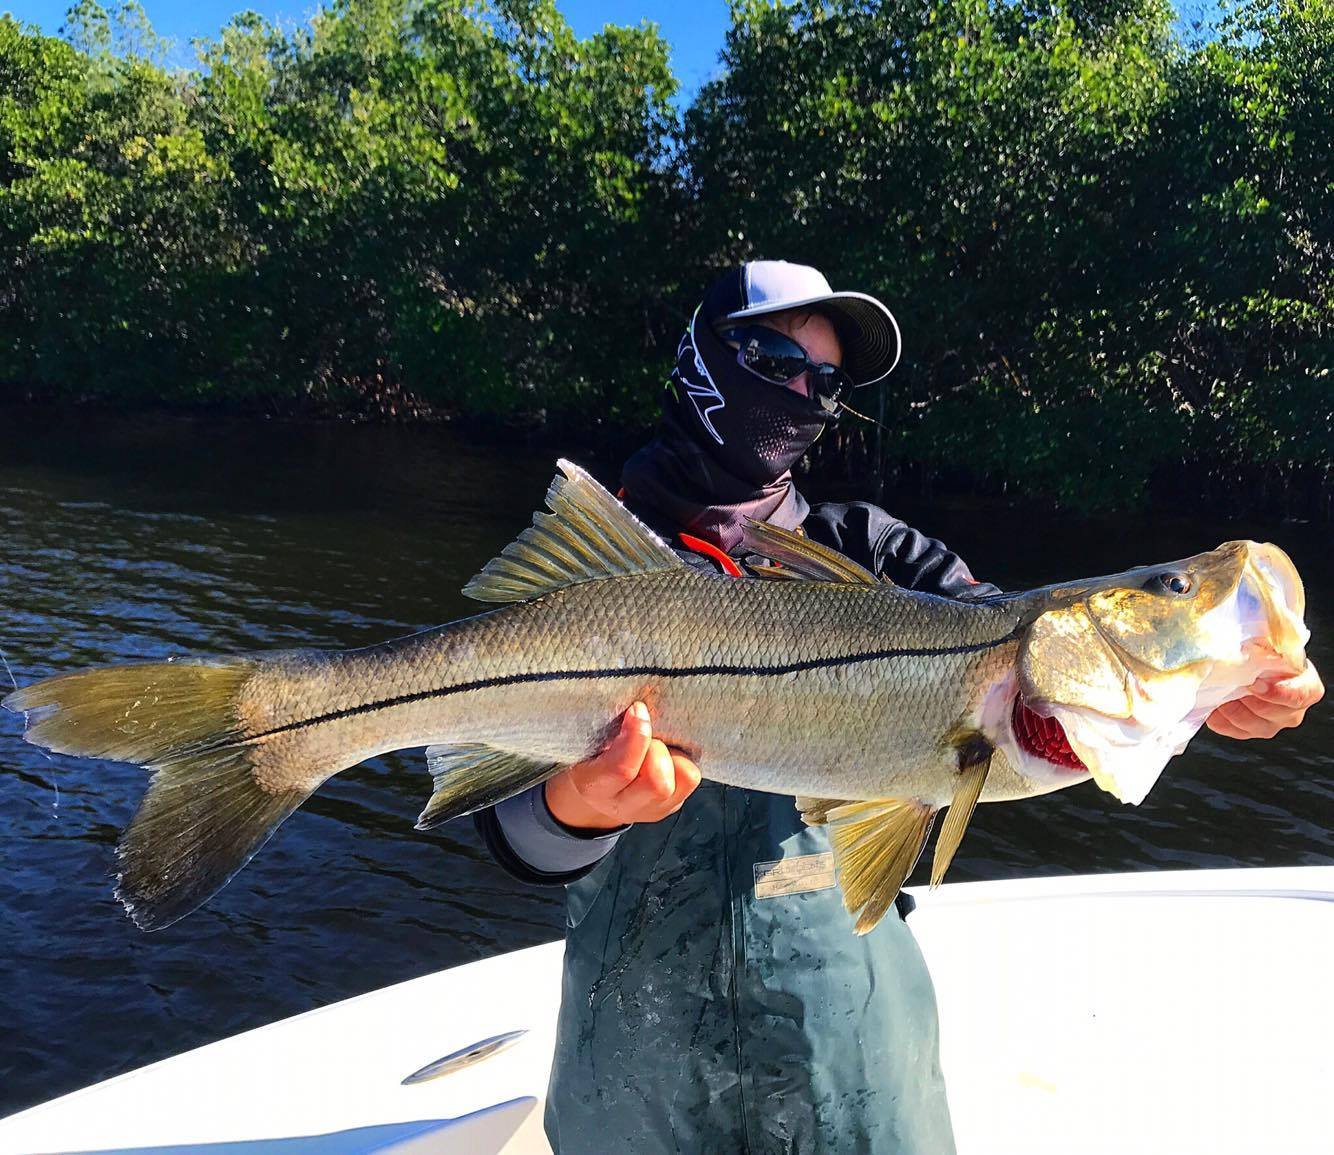 Monster Snook Fishing in Ruskin/Tampa Bay